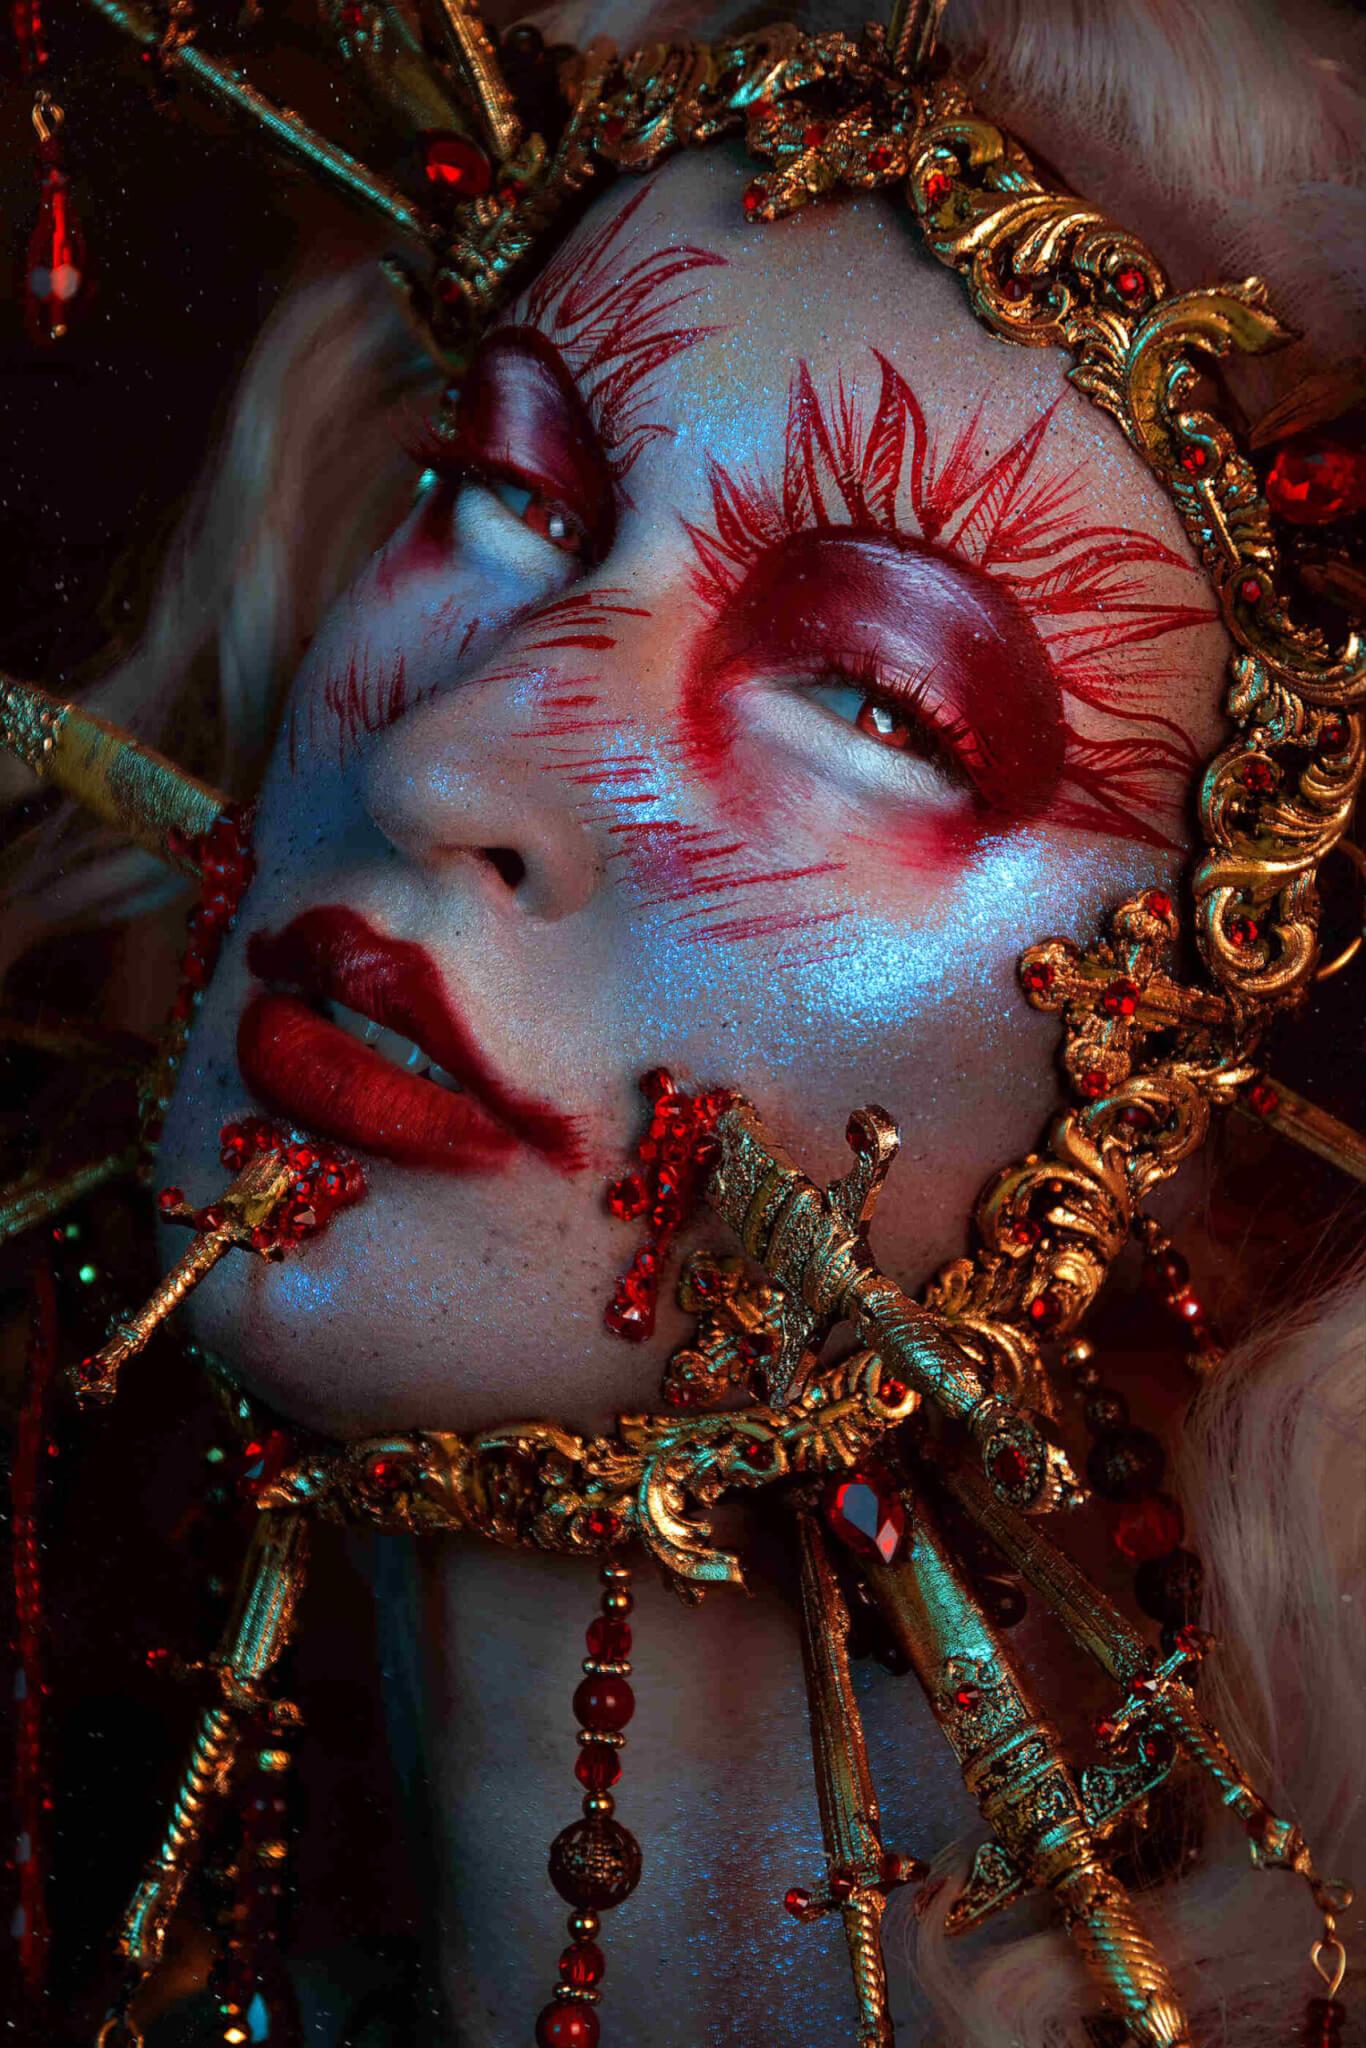 sister maria - candy makeup artist